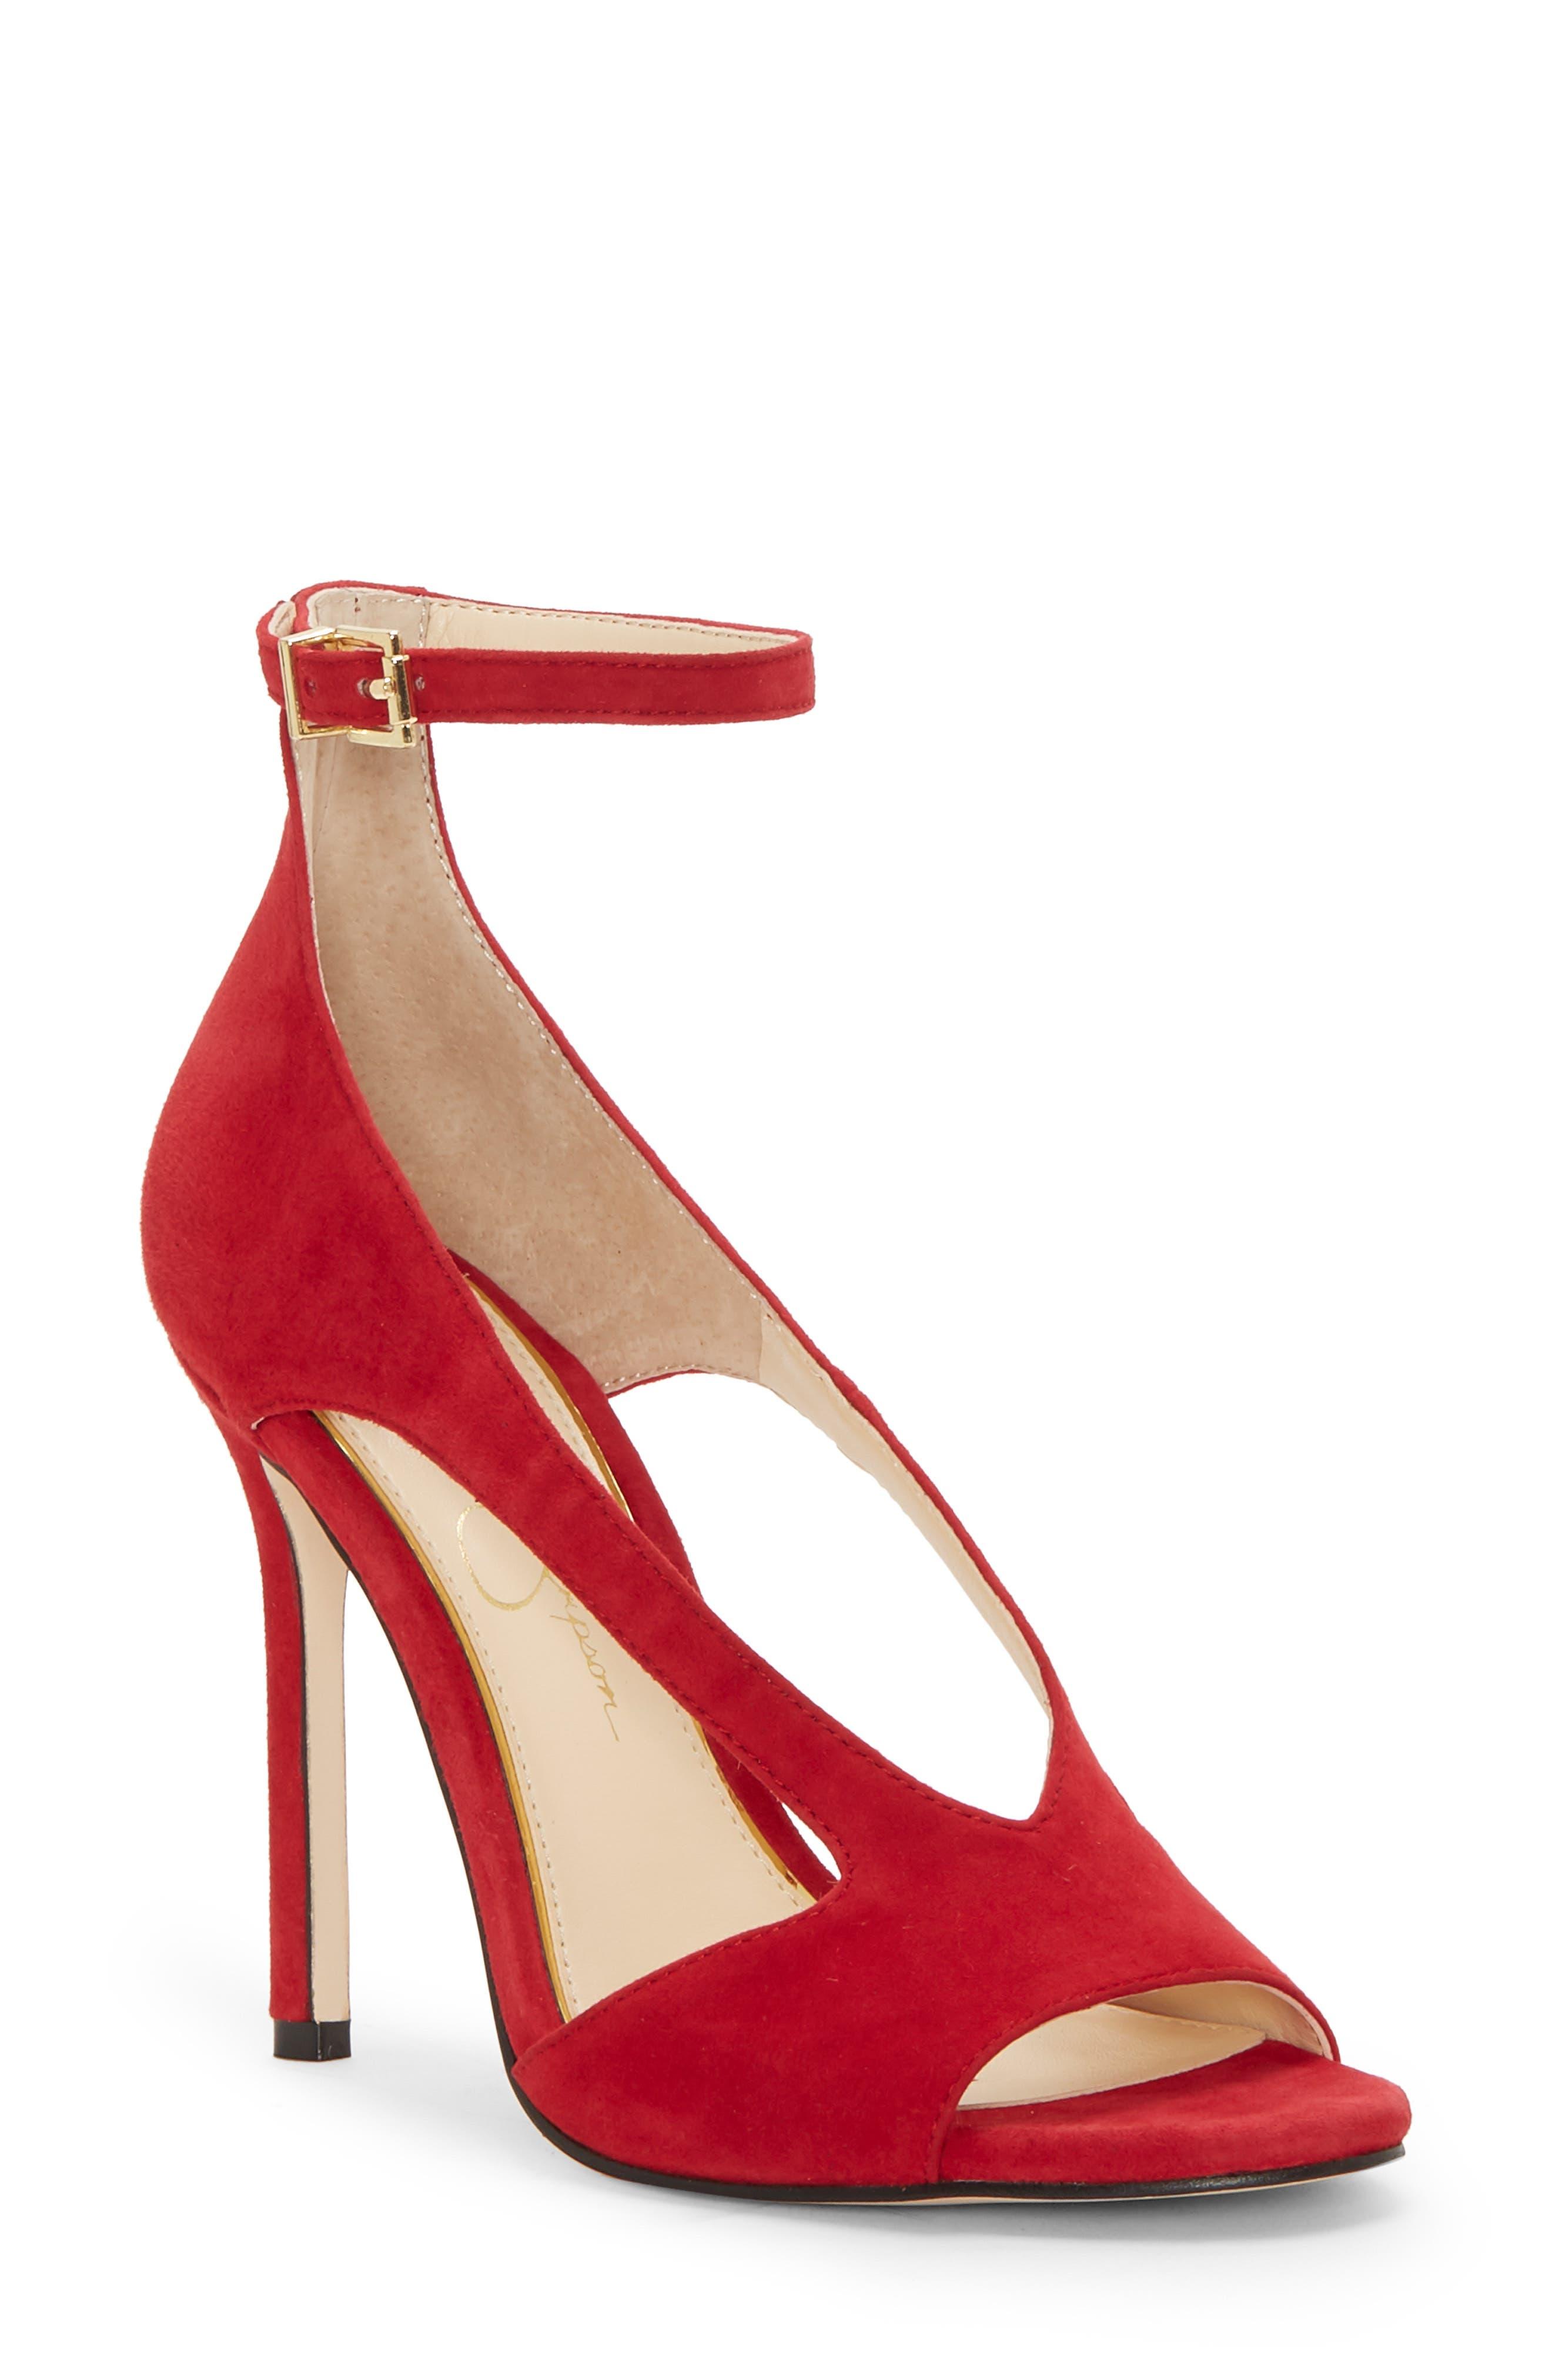 Jessica Simpson Jasta Ankle Strap Sandal, Red